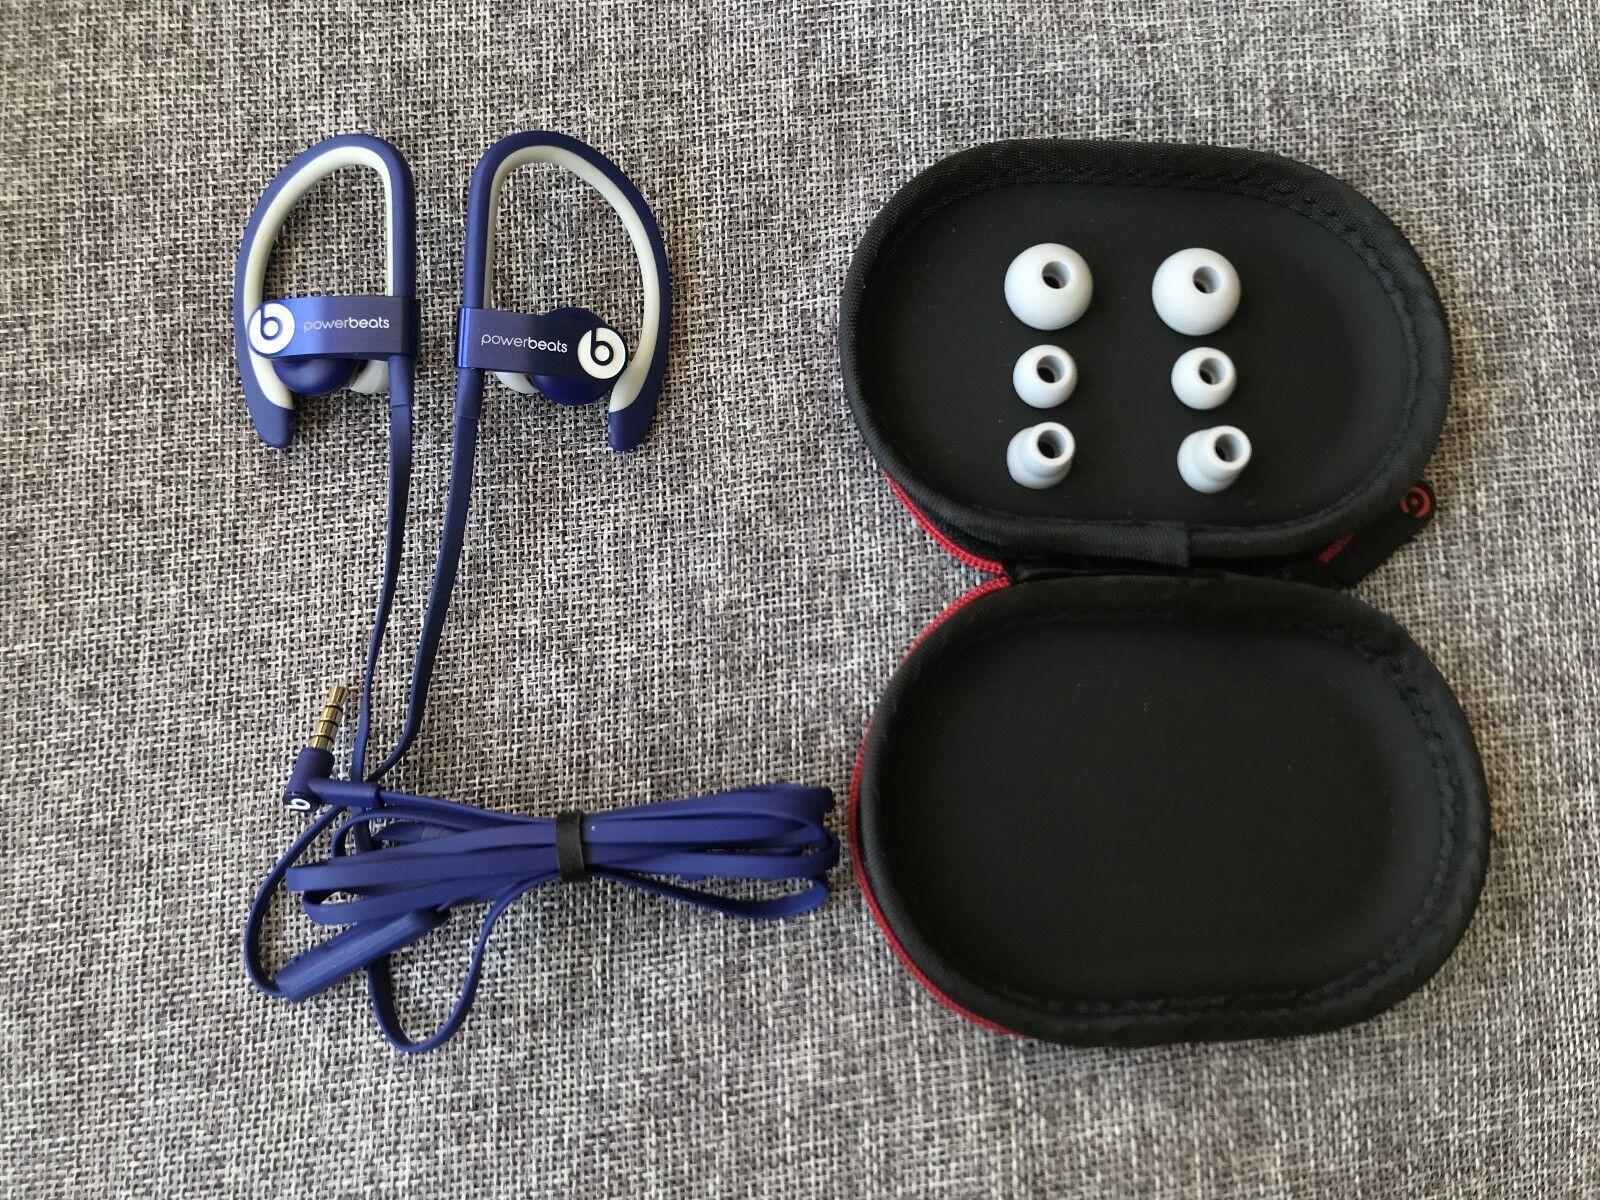 Beats by Dr. Dre Powerbeats 2 Wired In Ear Headphones